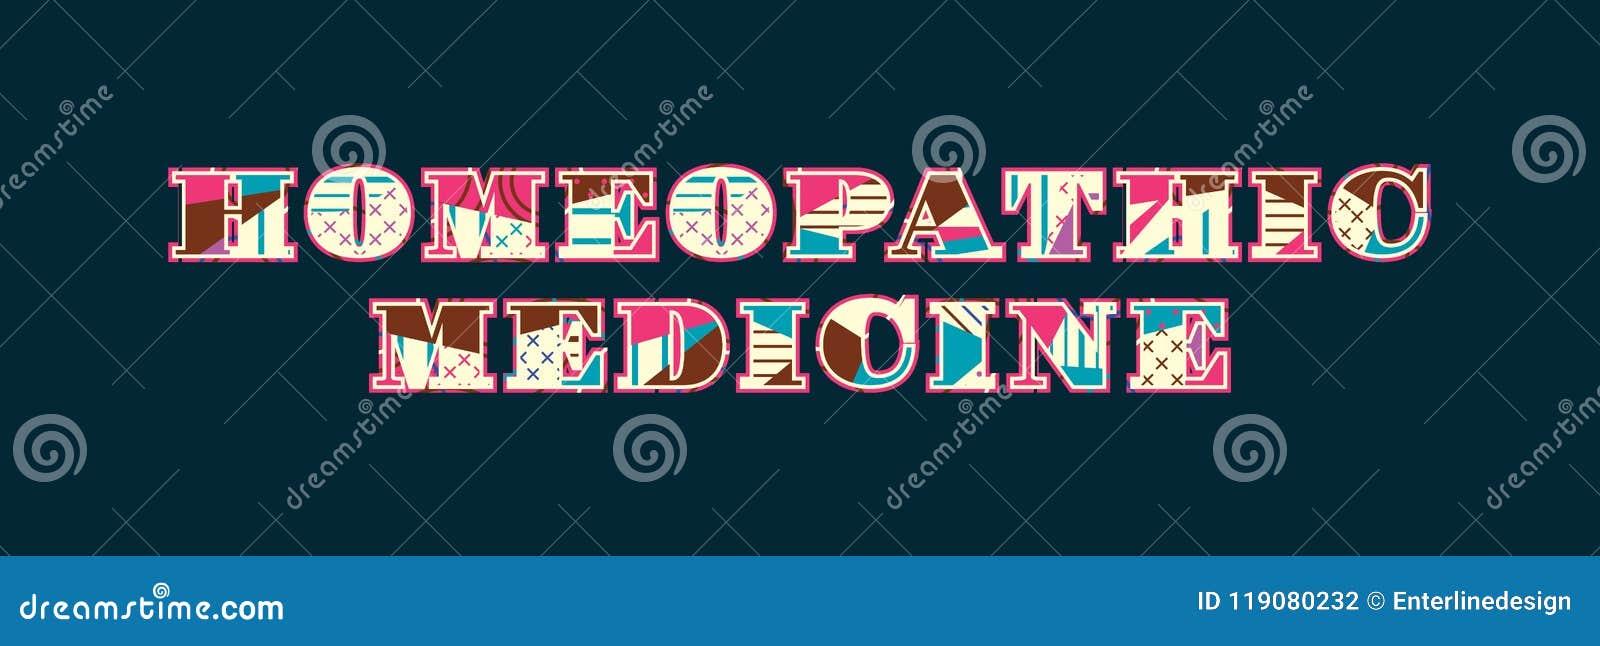 Homeopathic Medicine Concept Word Art Illustration Stock